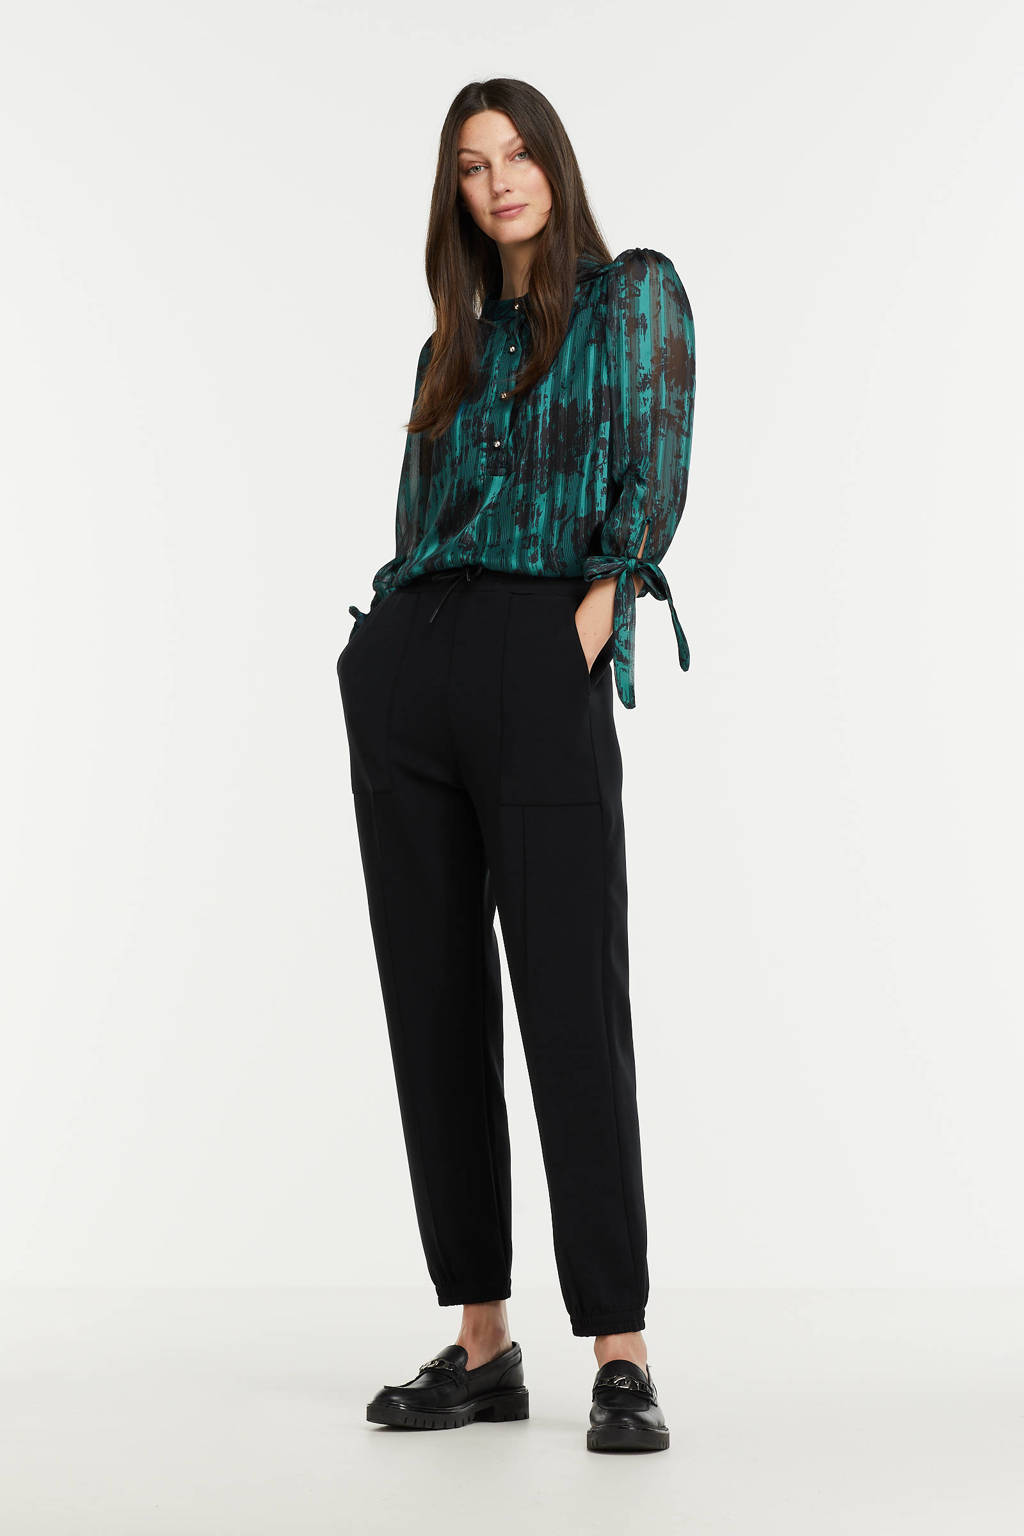 LOLALIZA semi-transparante blouse met all over print turquoise/zwart, Turquoise/zwart